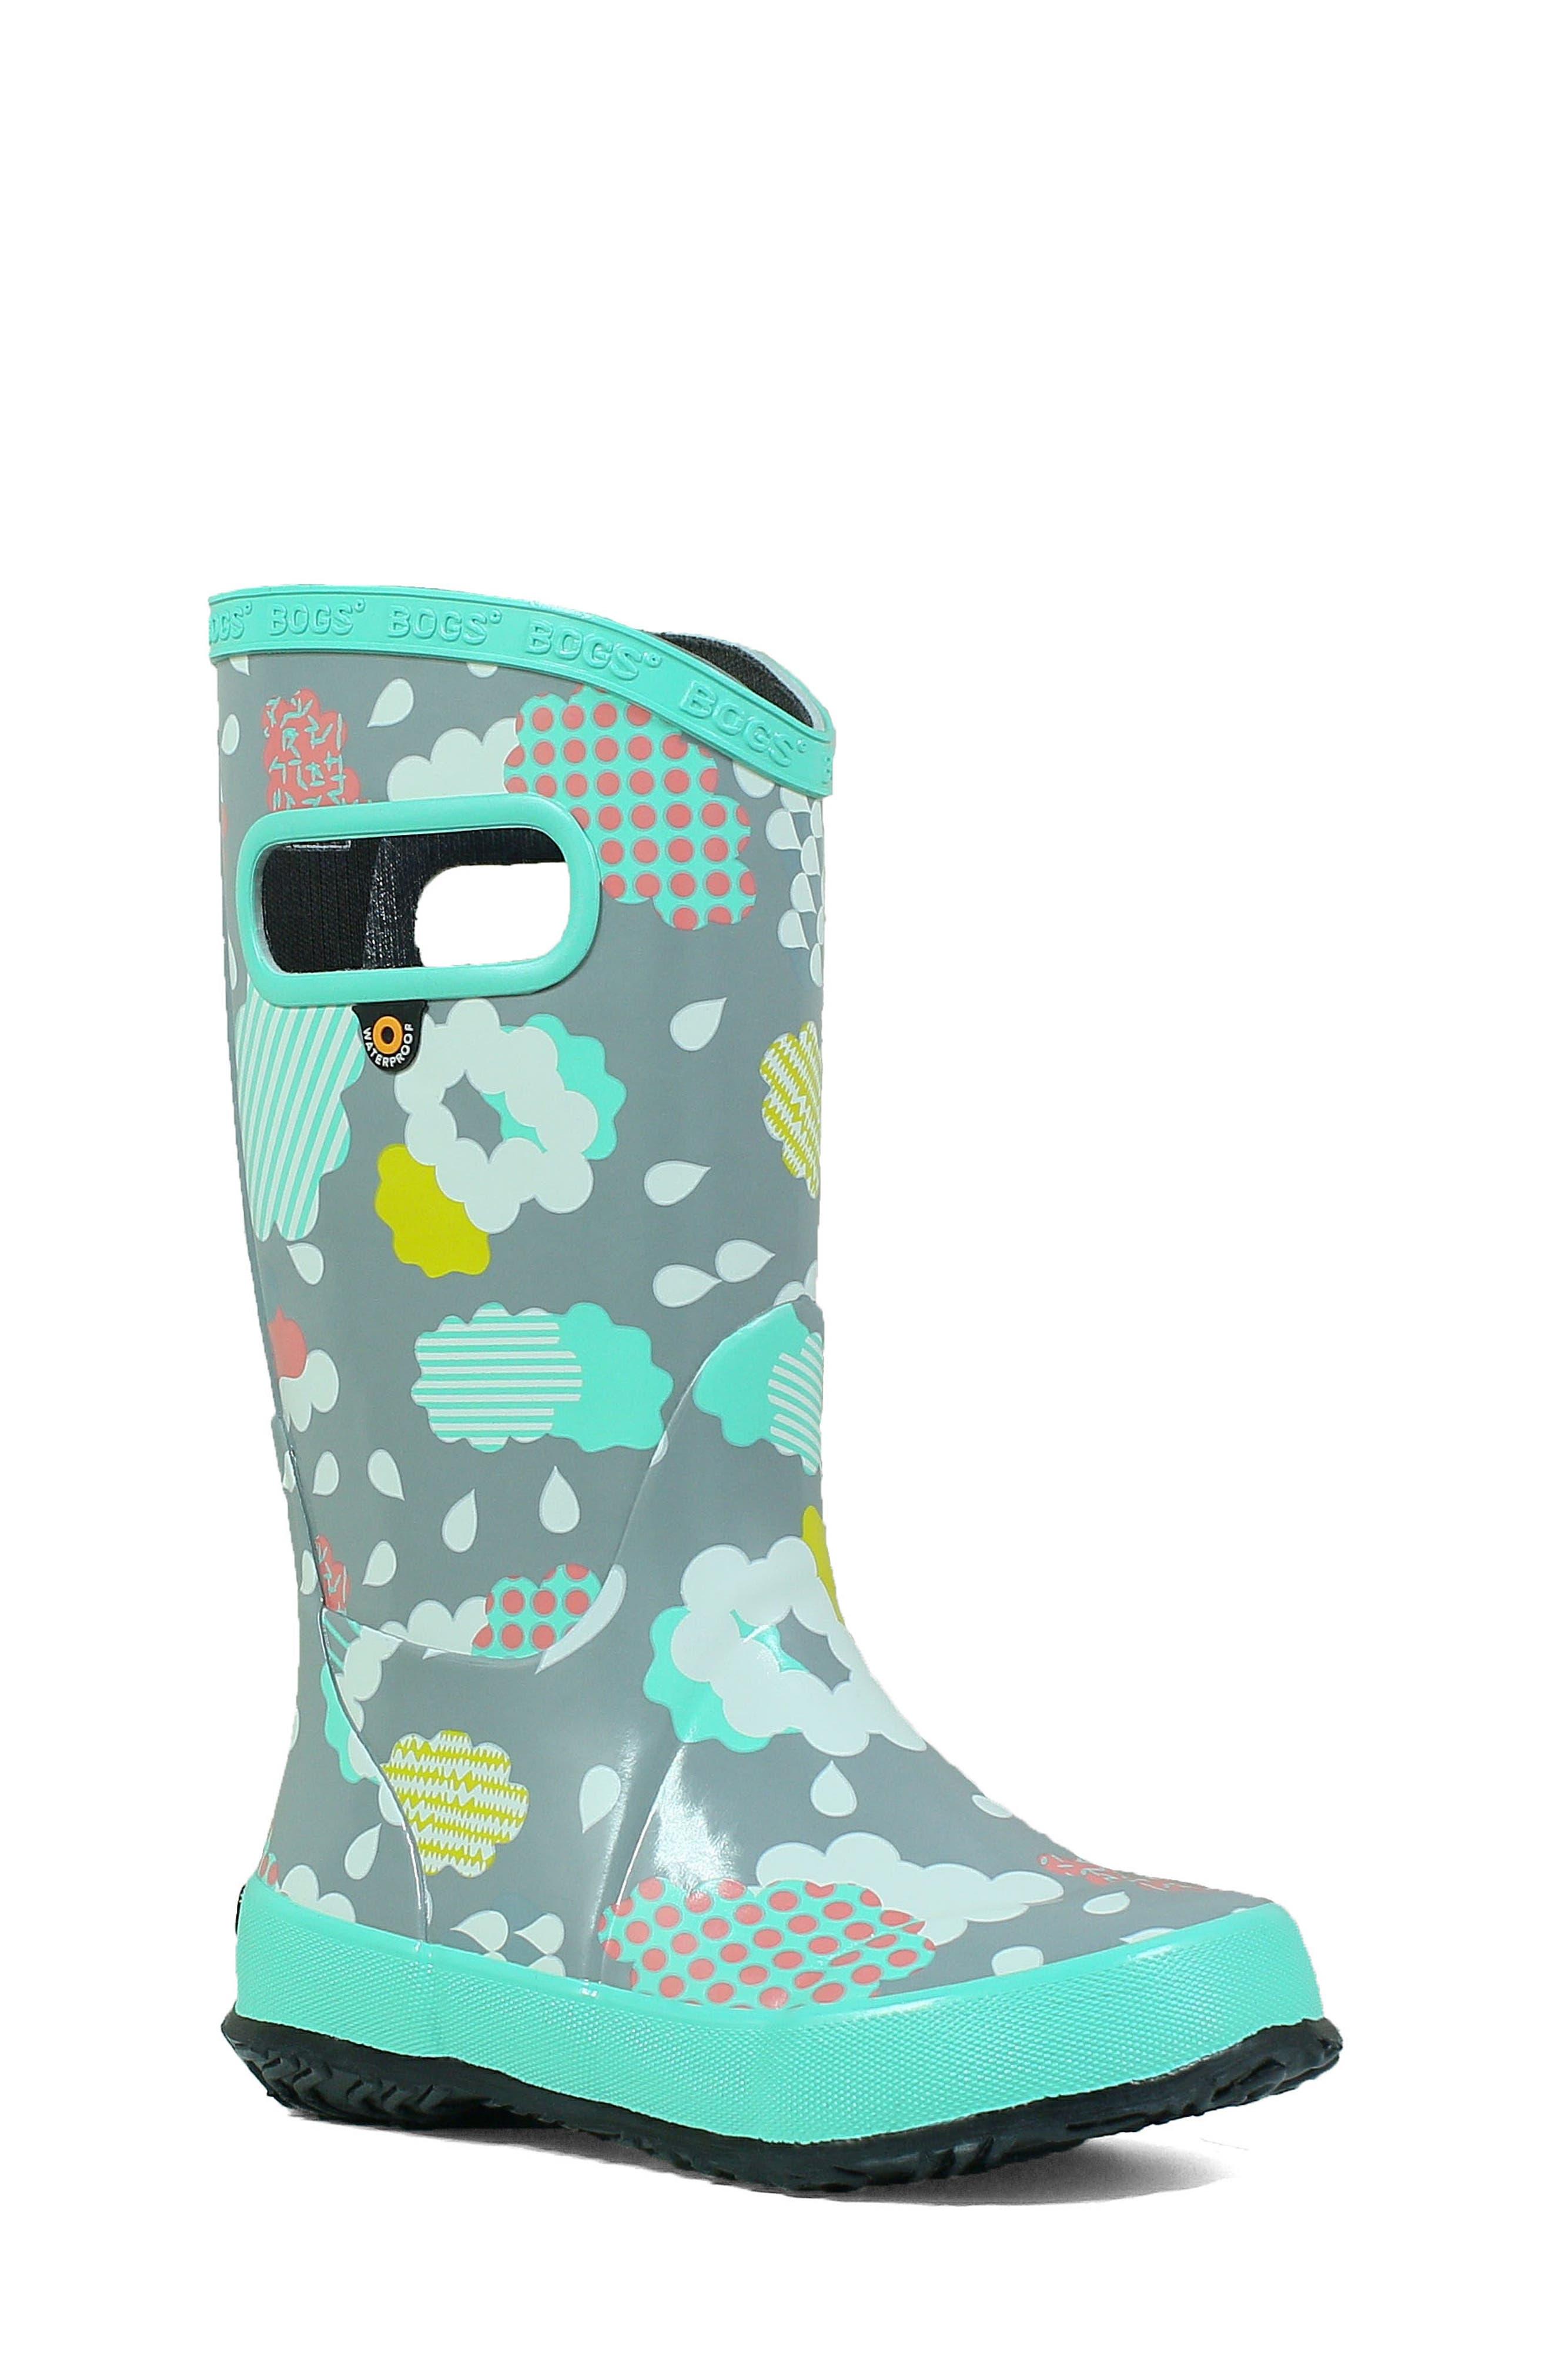 BOGS, Clouds Waterproof Rain Boot, Main thumbnail 1, color, 062